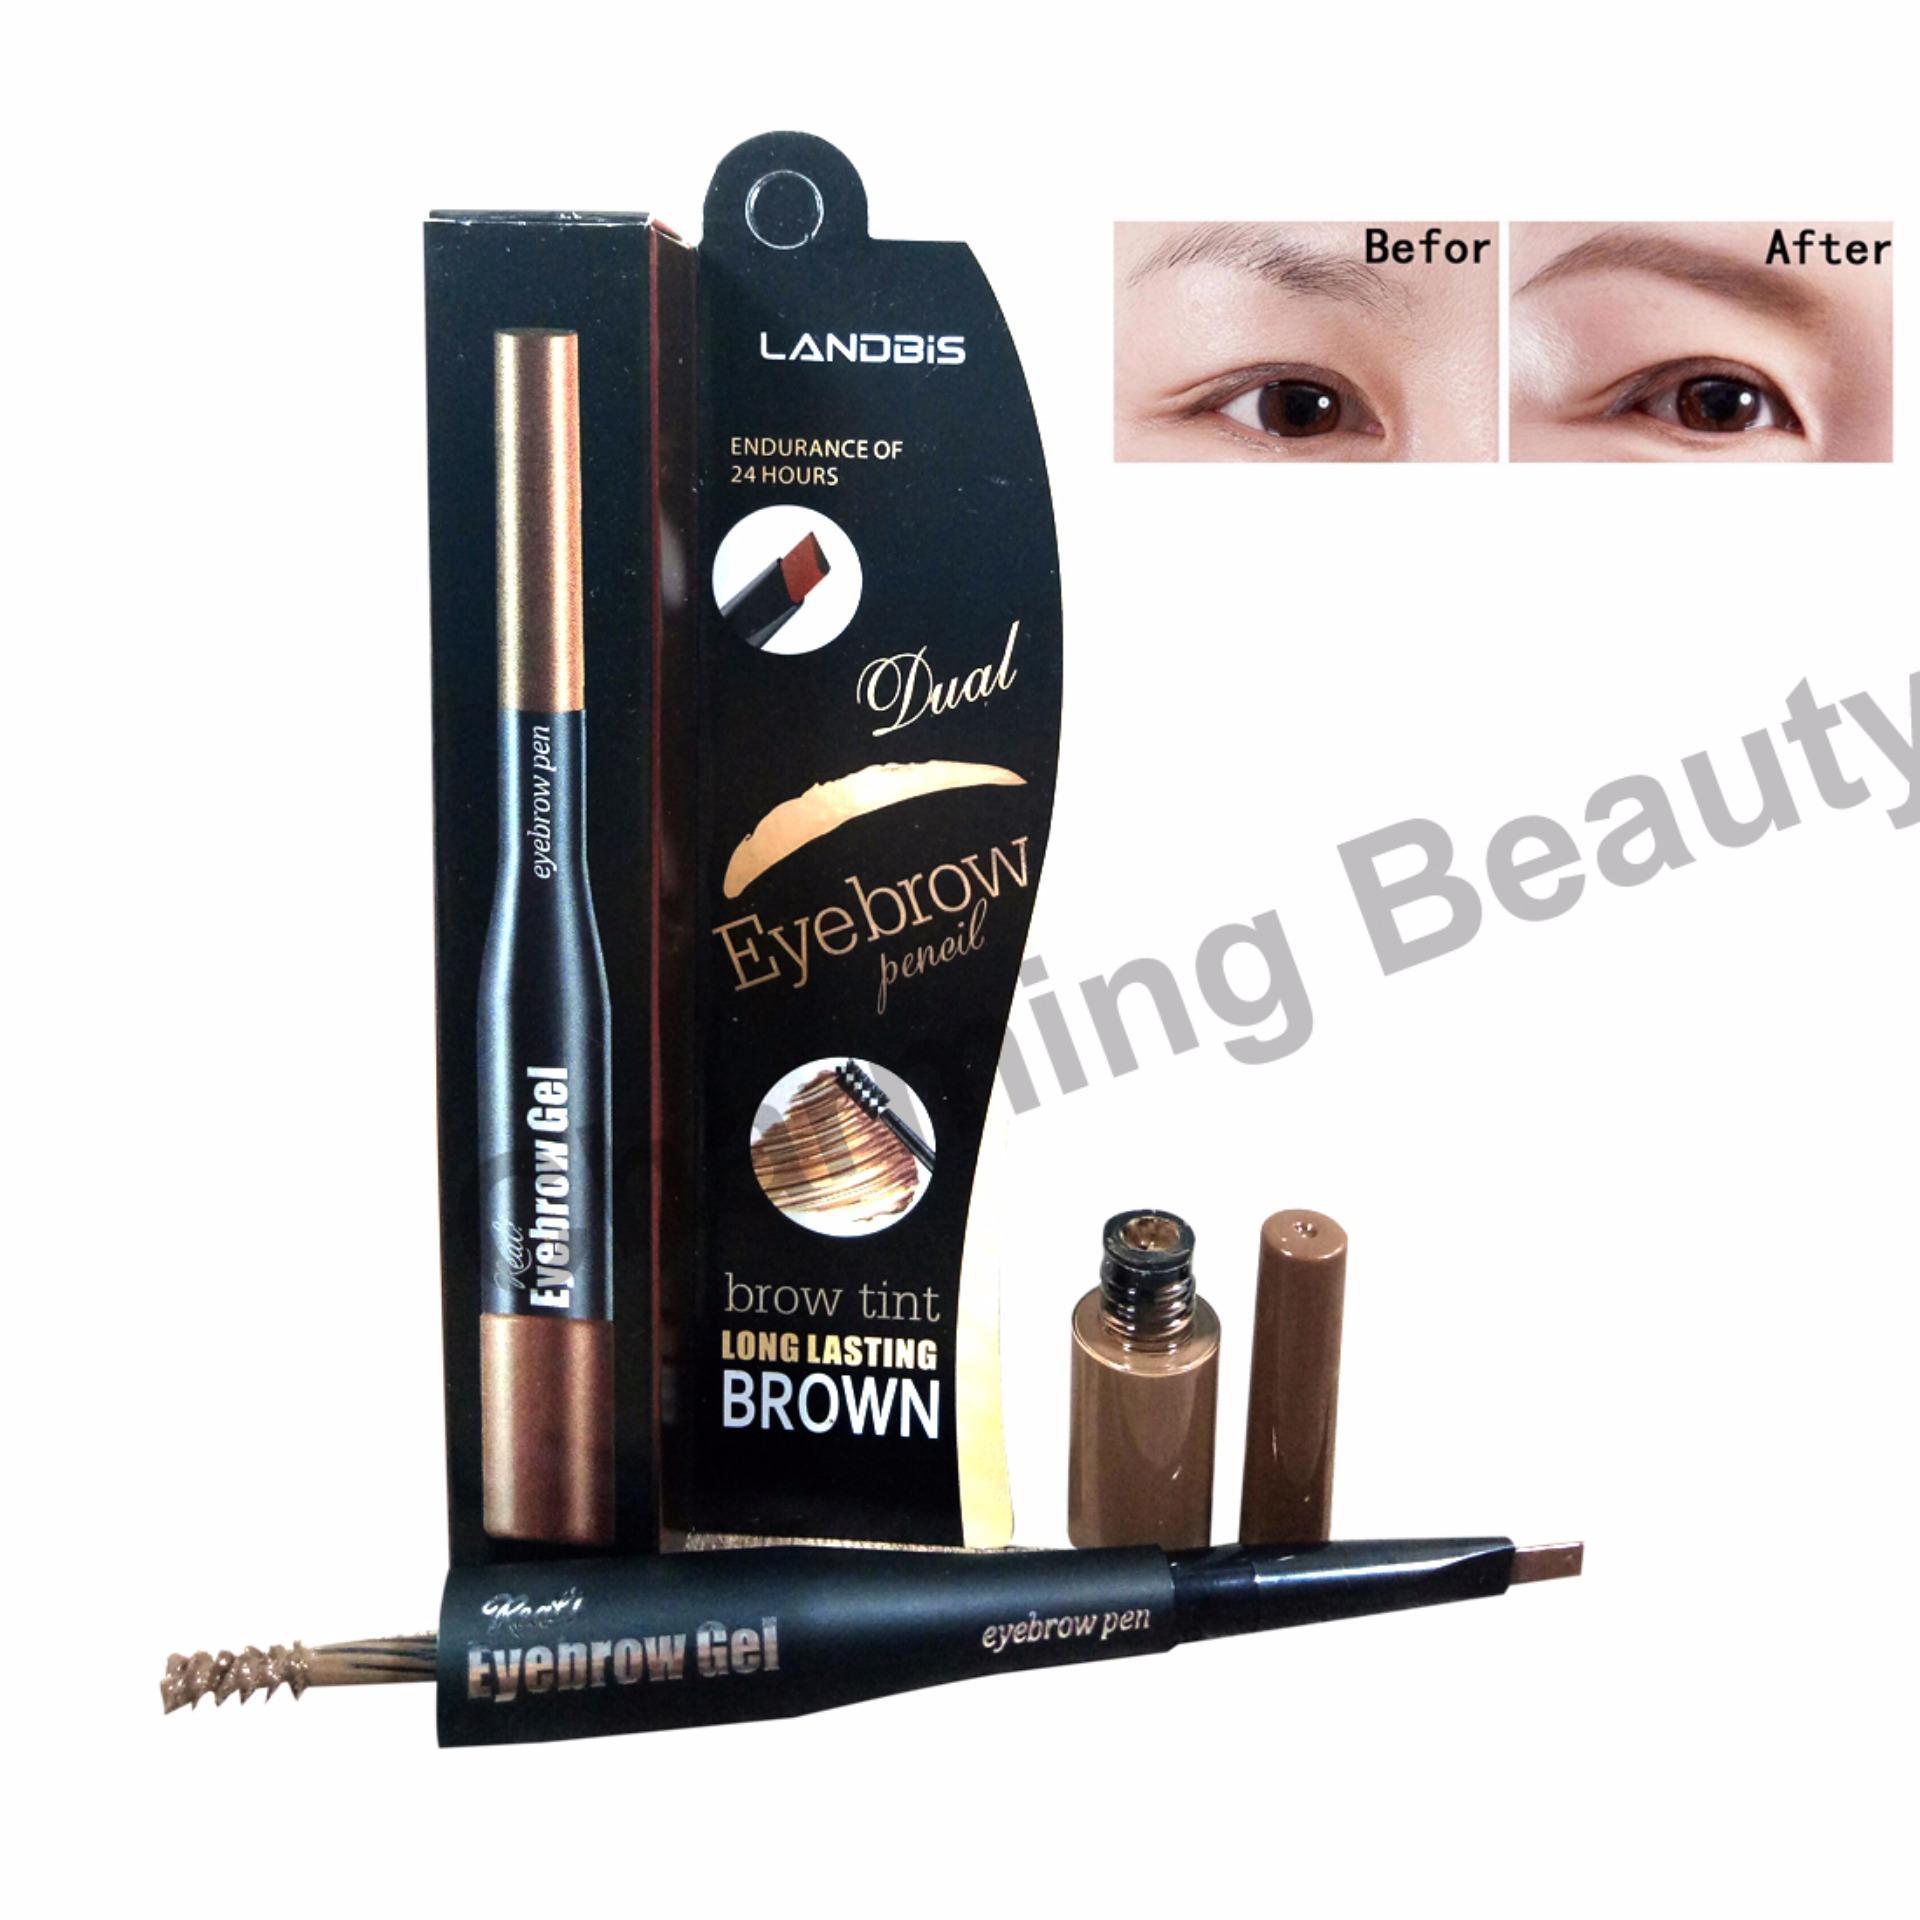 Philippines Landbis Dual Eyebrow Pencil And Eyebrow Gel Brow Tint